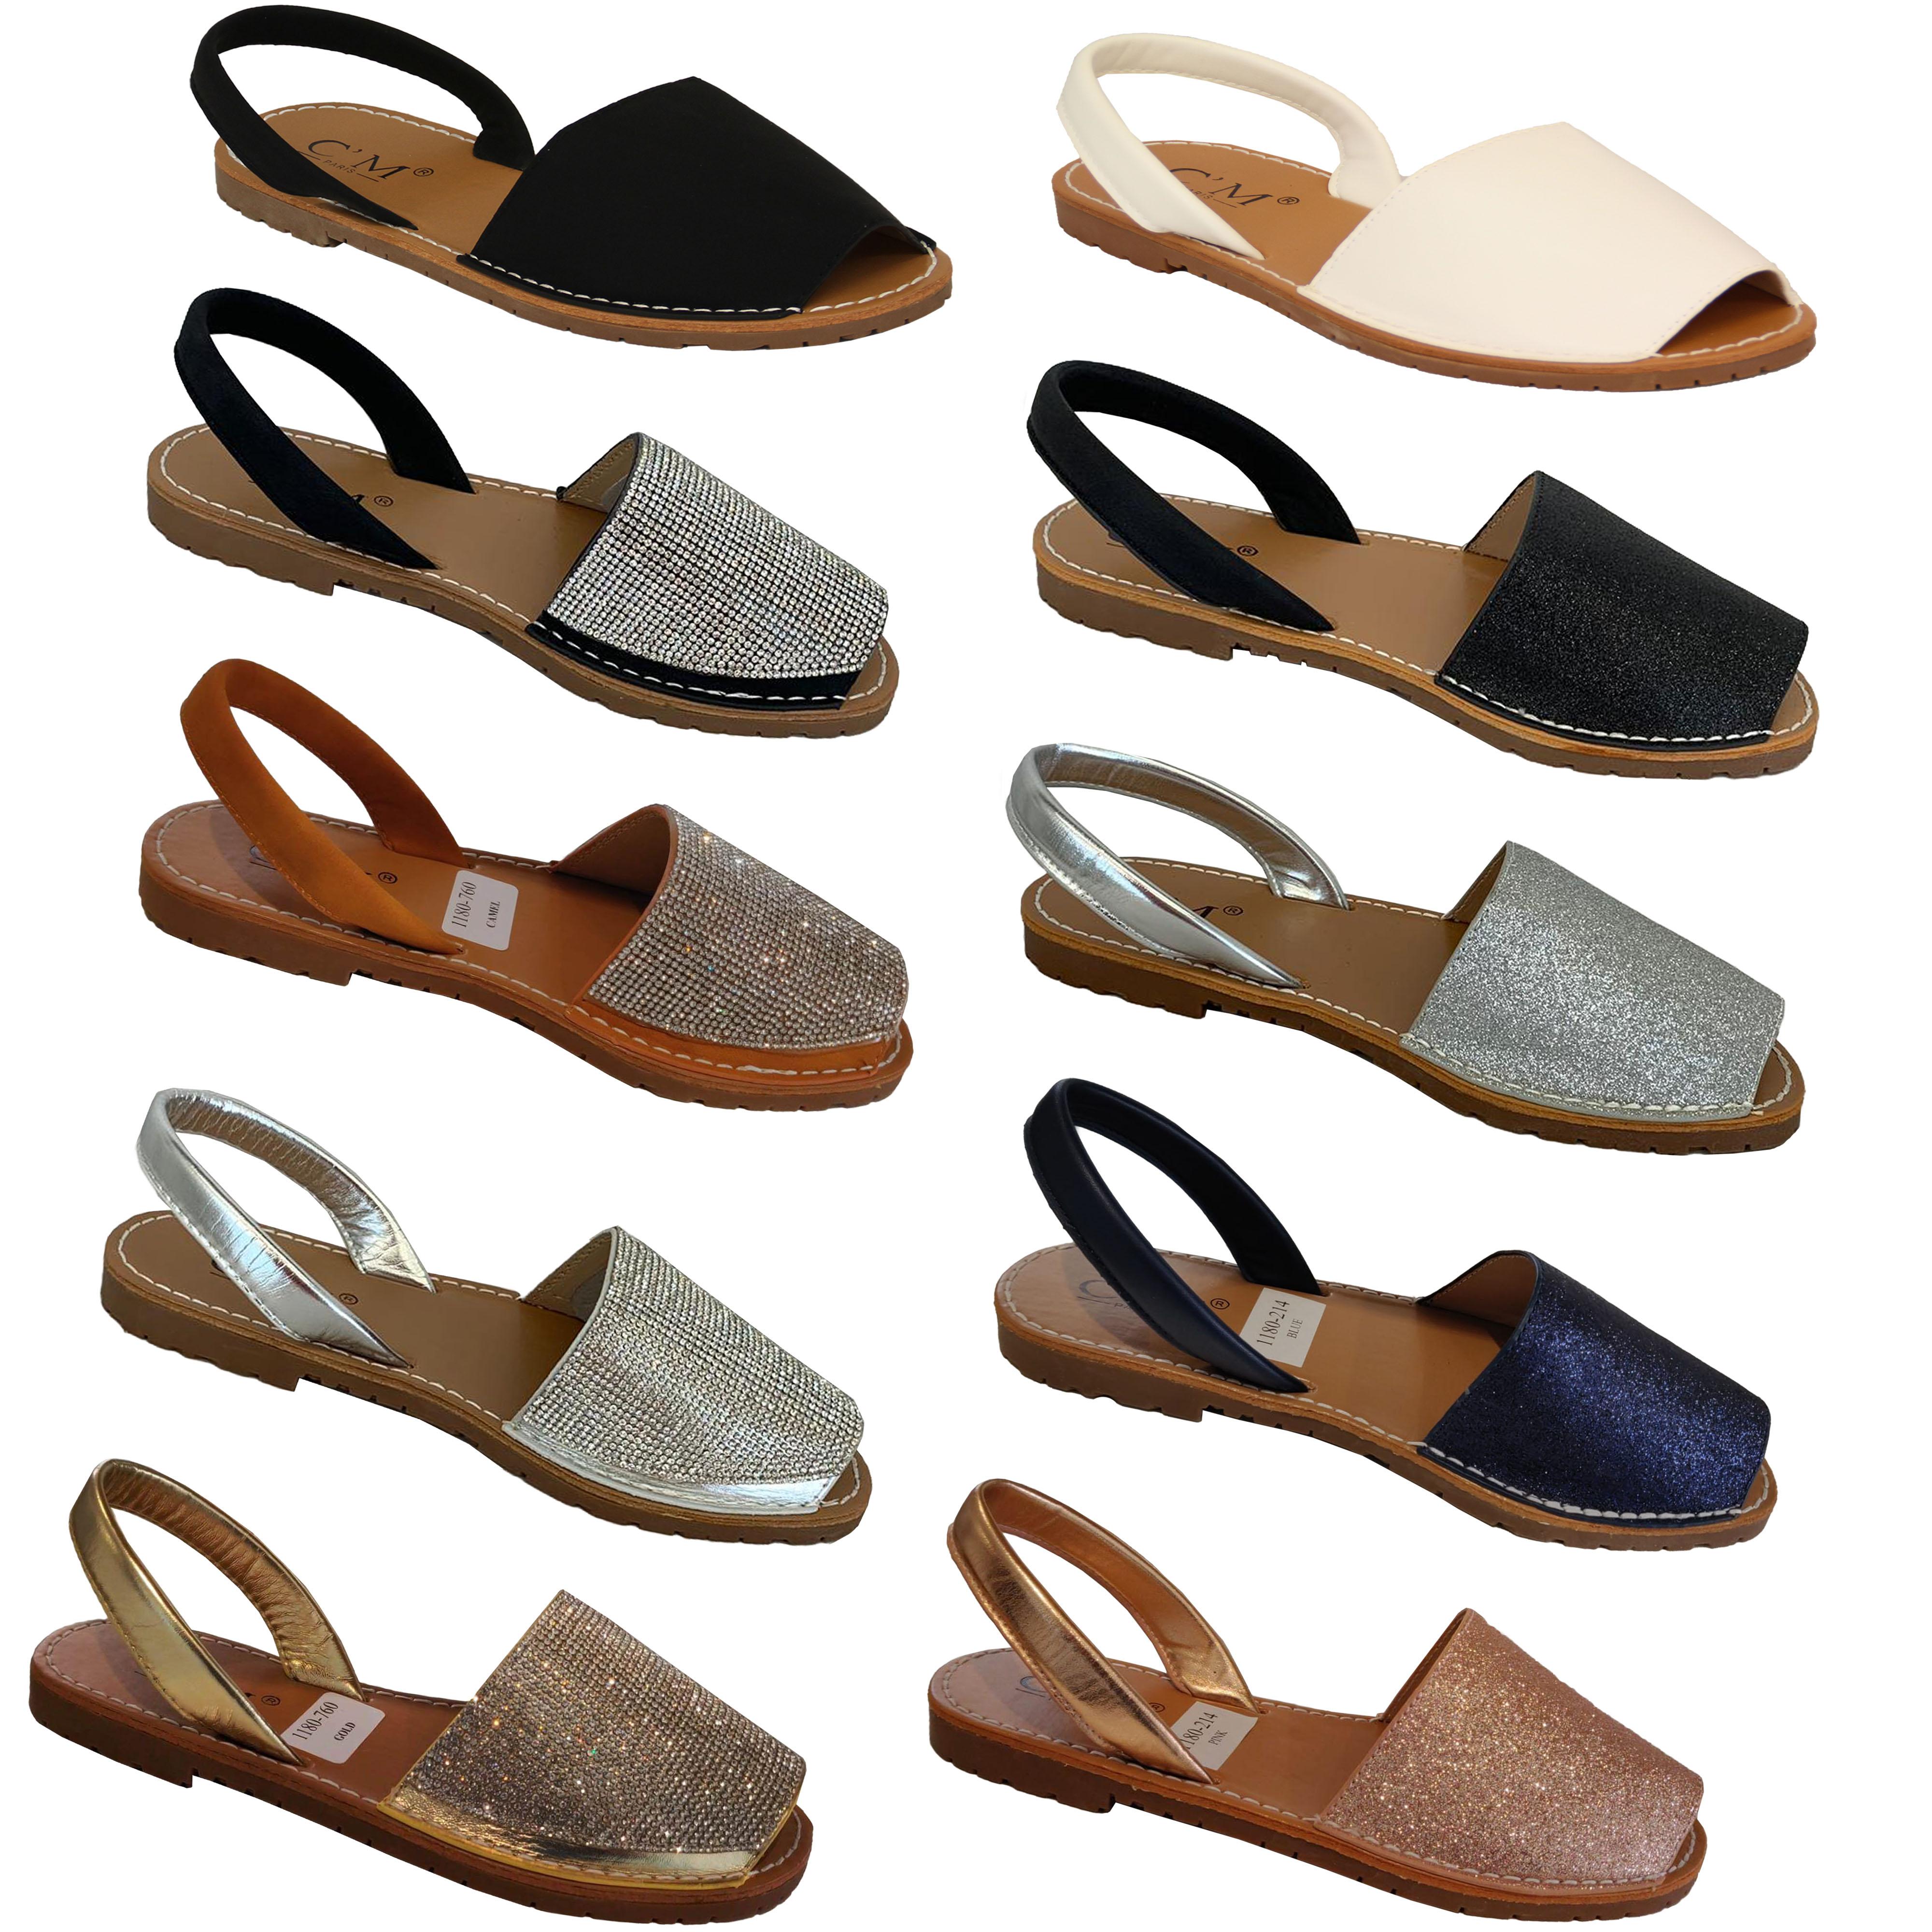 Ladies Summer Beach Slingback Flat Open Toe Flip Flop Menorcan Shoes Sandals 3-8